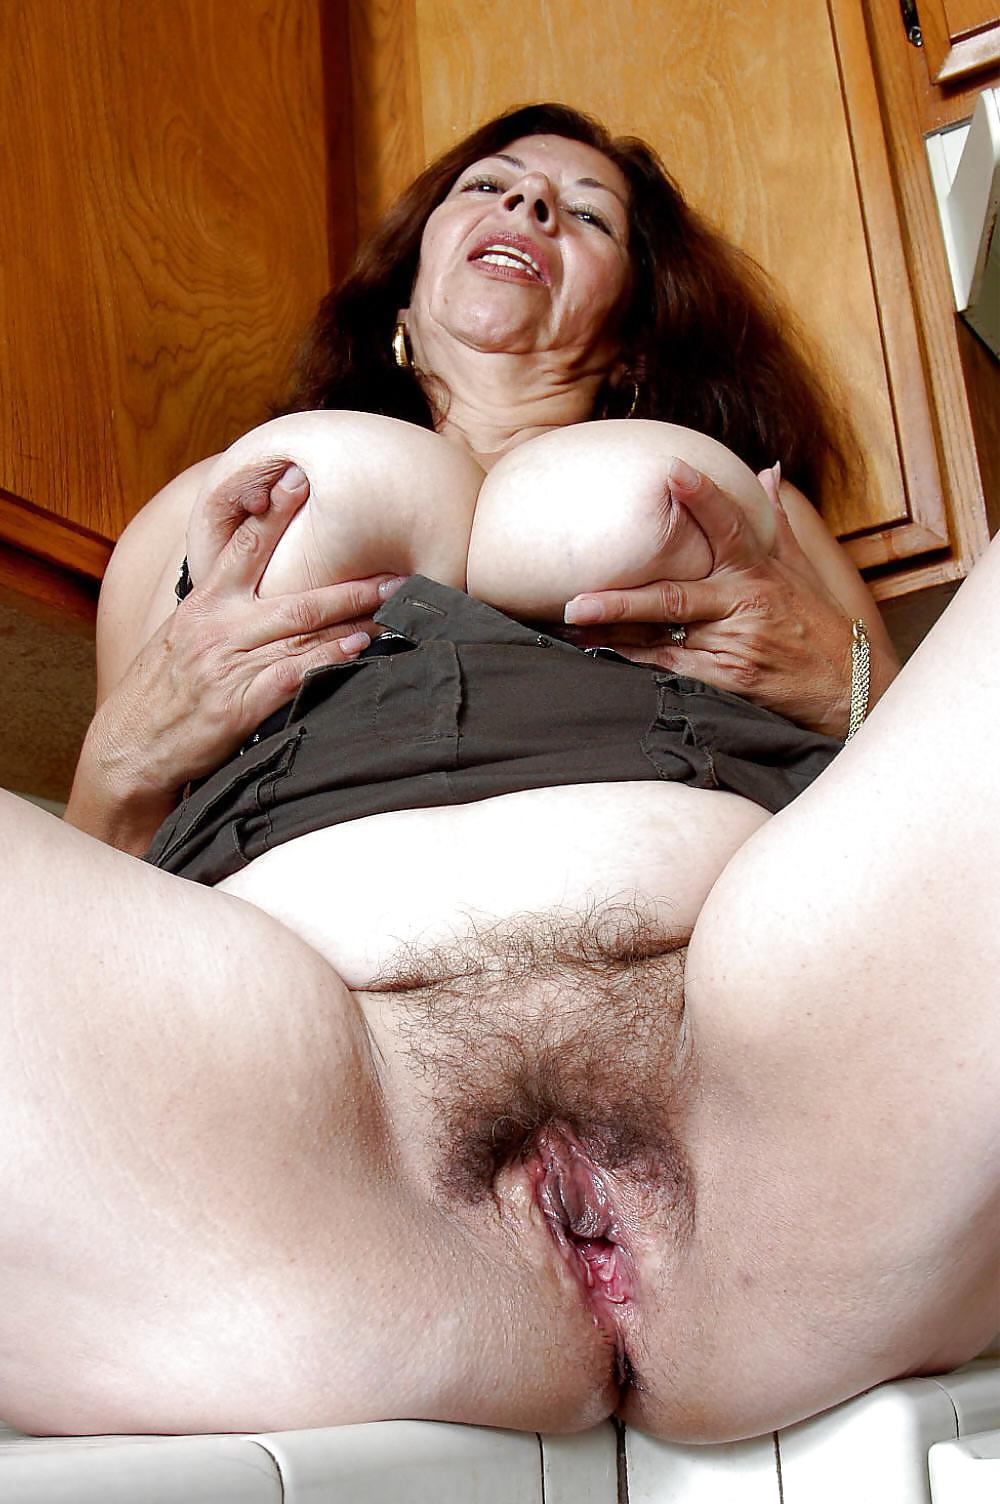 Natural mature women pics-9236